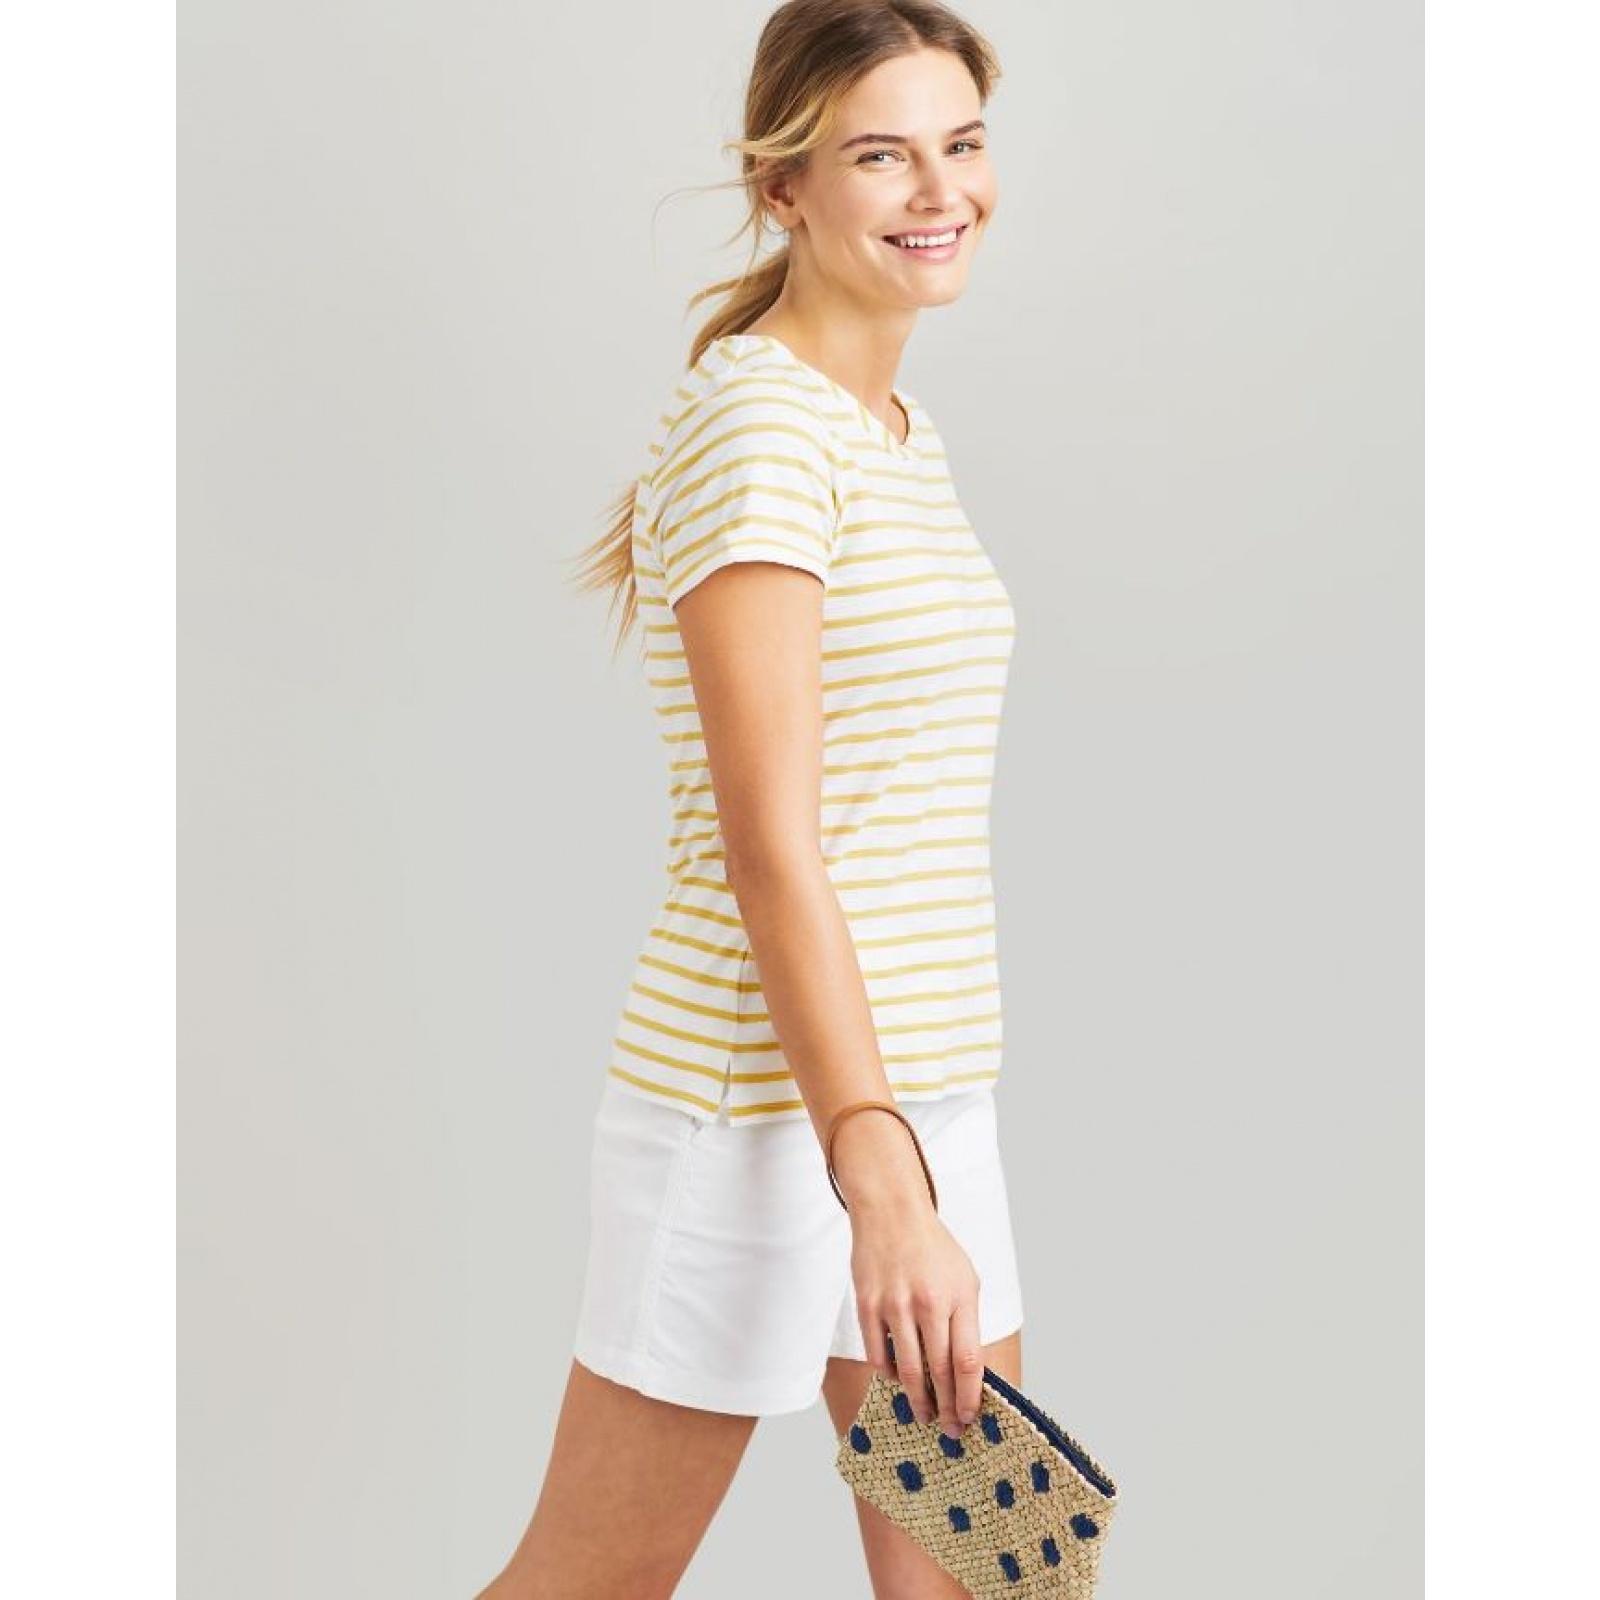 Joules-Nessa-Raya-Ligero-Jersey-Camiseta-SS19 miniatura 31